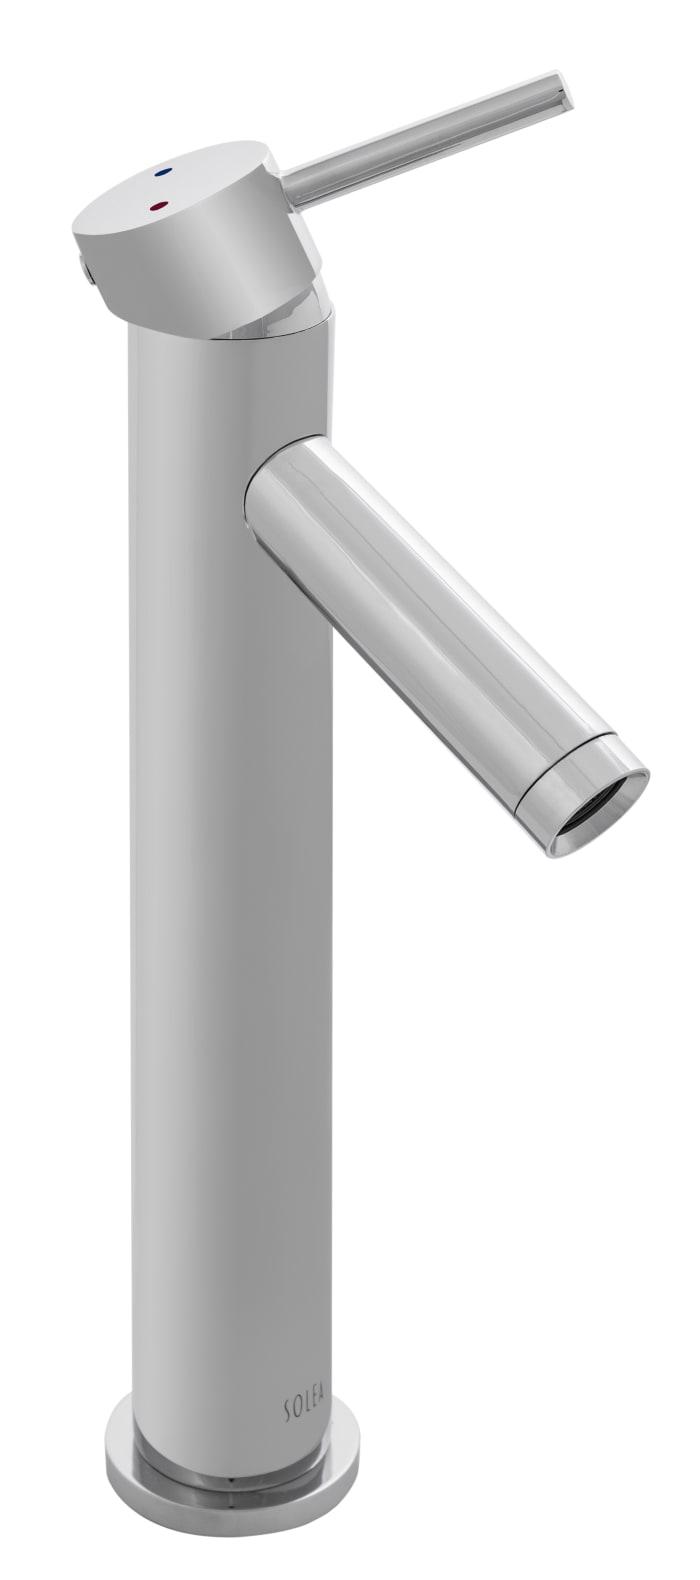 Elation Chrome Brass Single Handle 12 Inch Bathroom Vessel Faucet